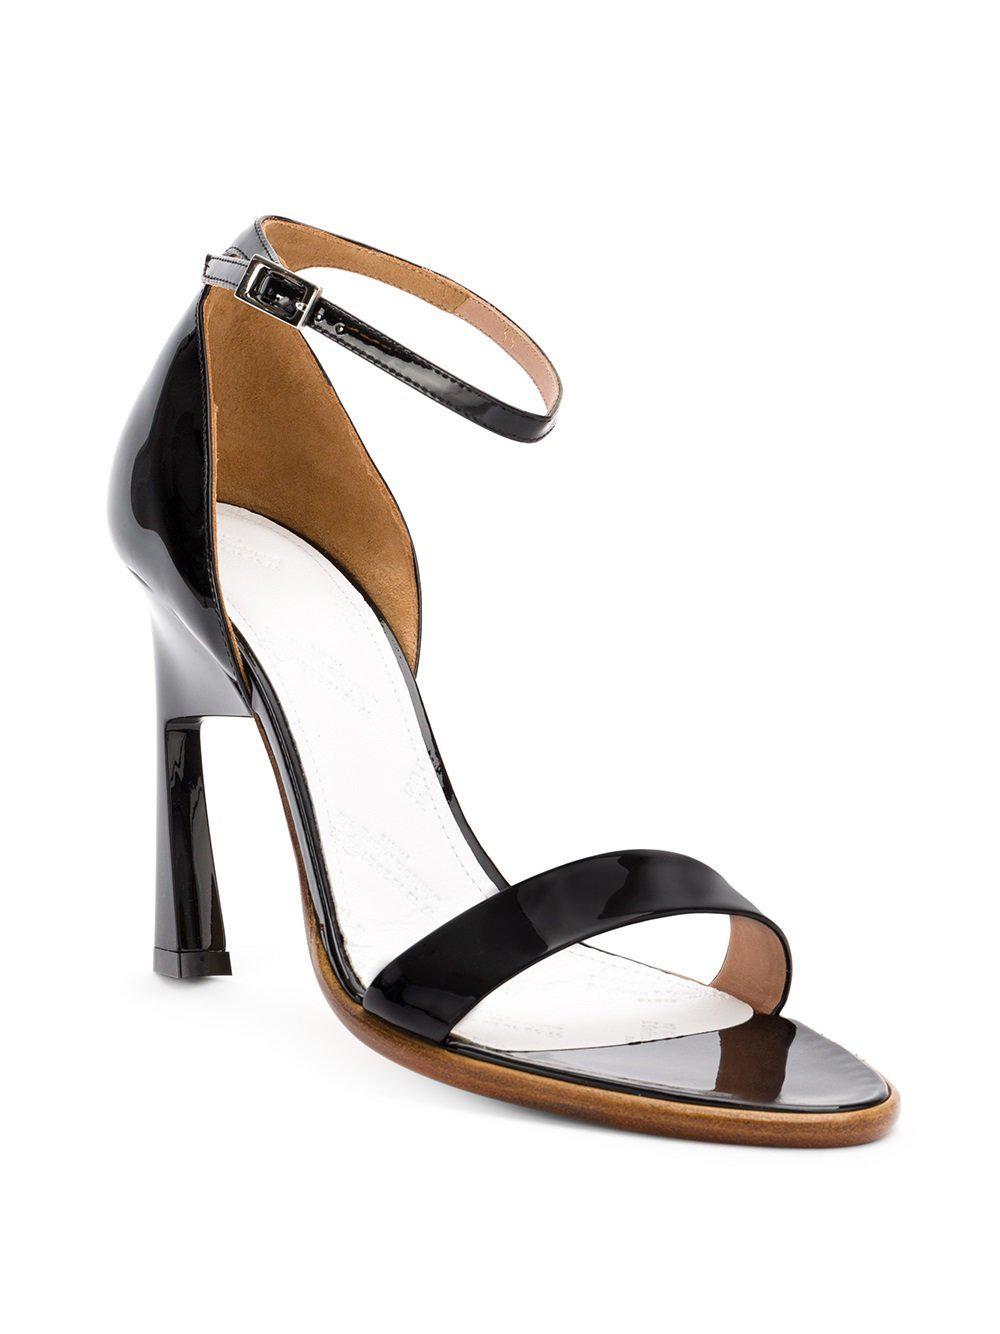 geometric heel sandals - Metallic Maison Martin Margiela xUEa8imzpH